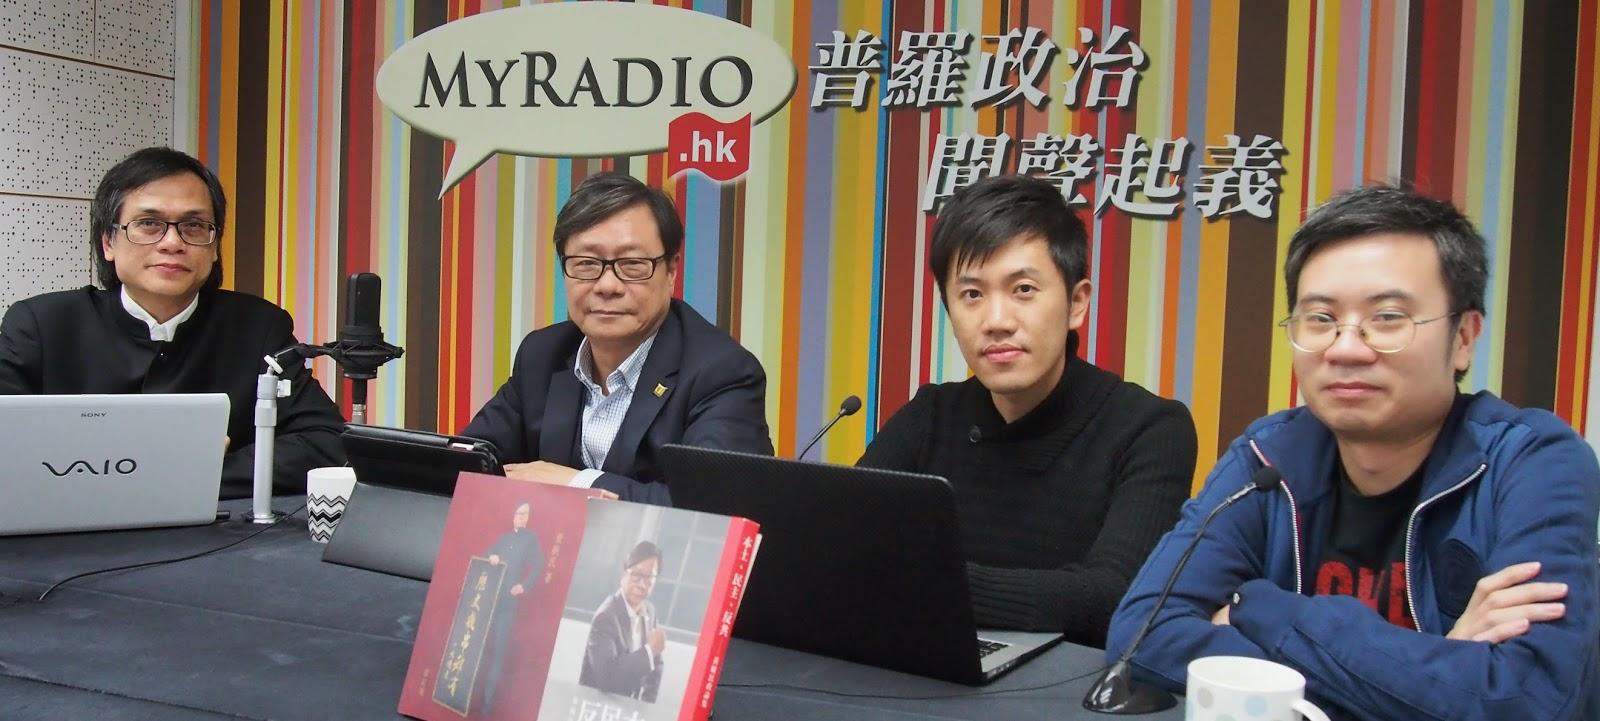 MyRadio.HK 臺務網誌: 黃毓民 毓民踩場 150119 ep658